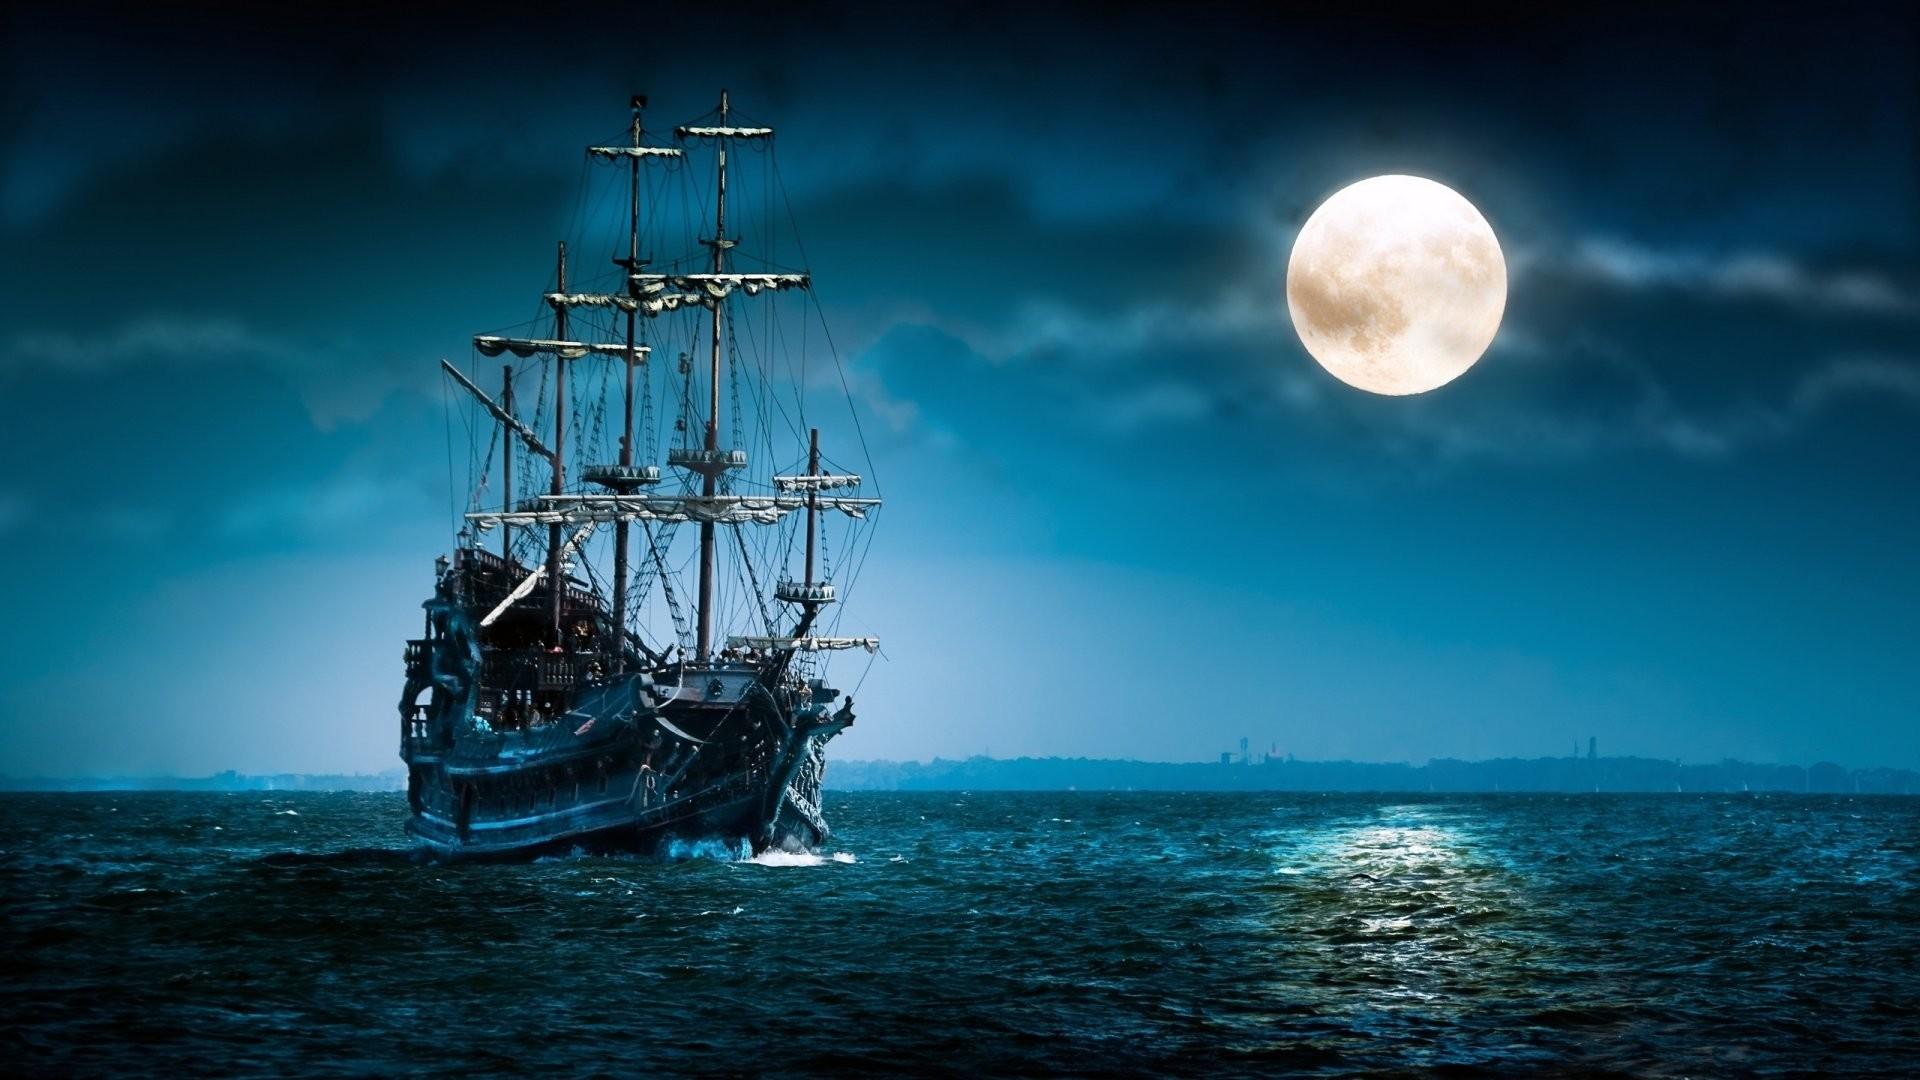 Res: 1920x1080, Sailboat sea moon ship boat ocean night mood wallpapers HD.